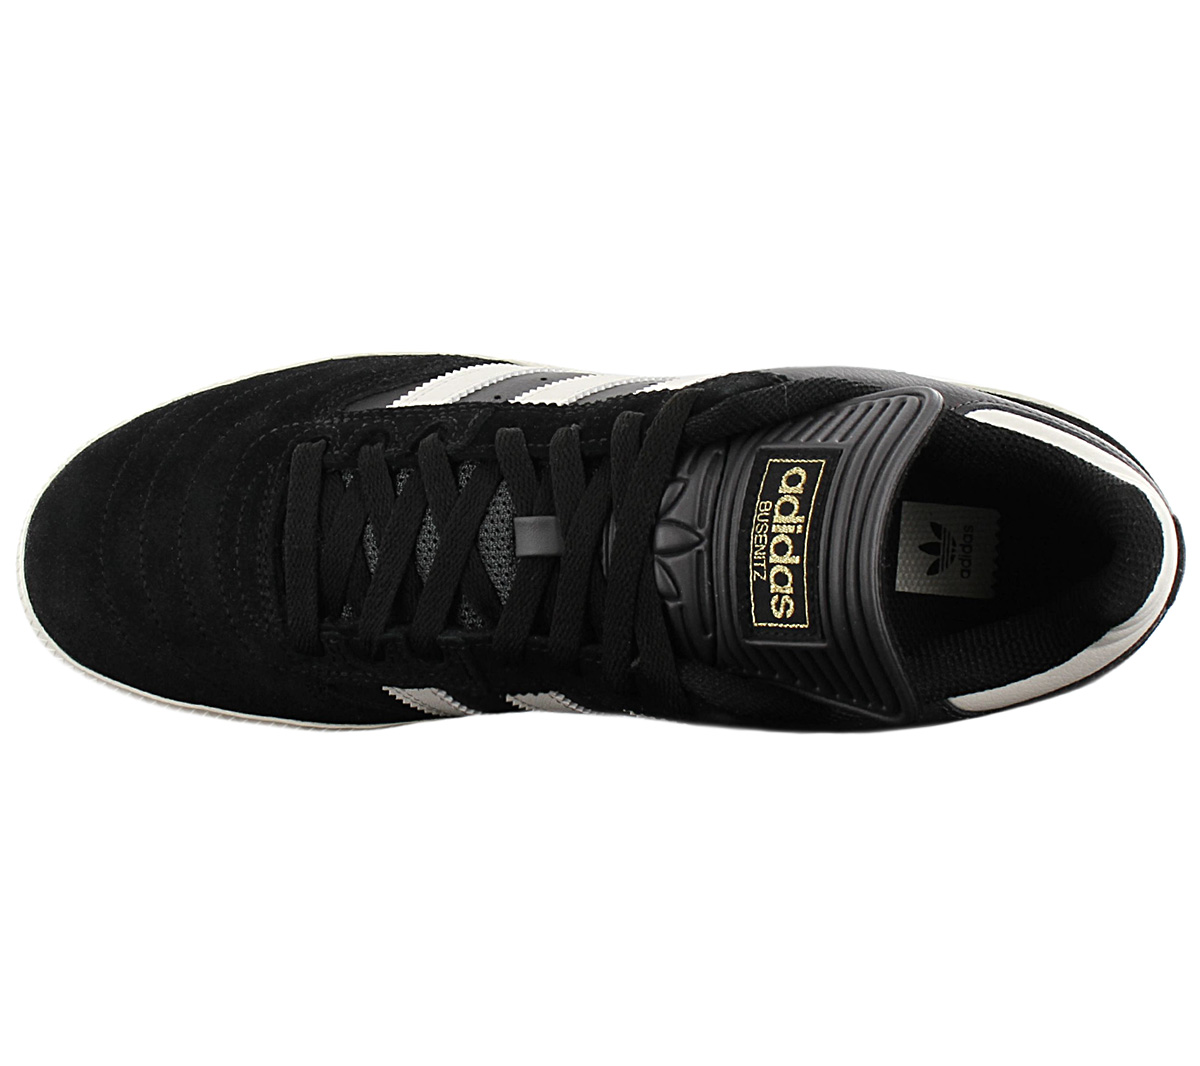 Details about Adidas Originals Busenitz pro Men's Sneaker CQ1156 Skate Shoes Sneakers New